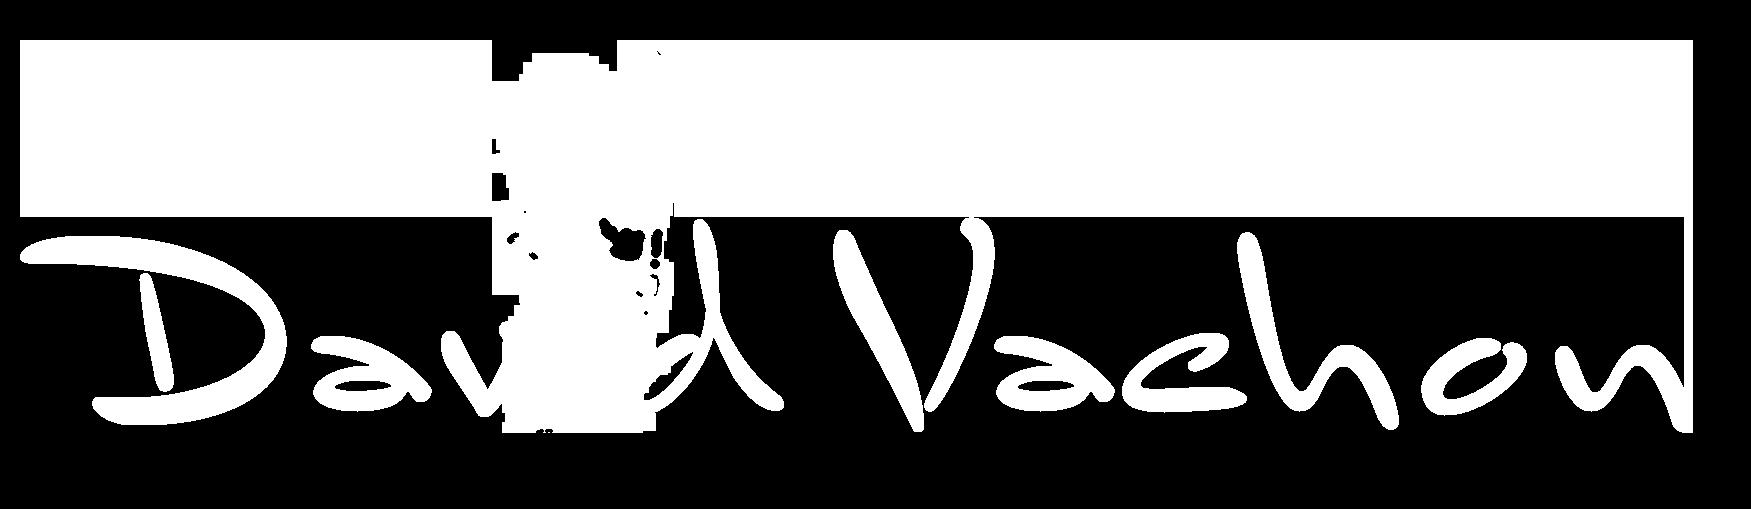 david vachon